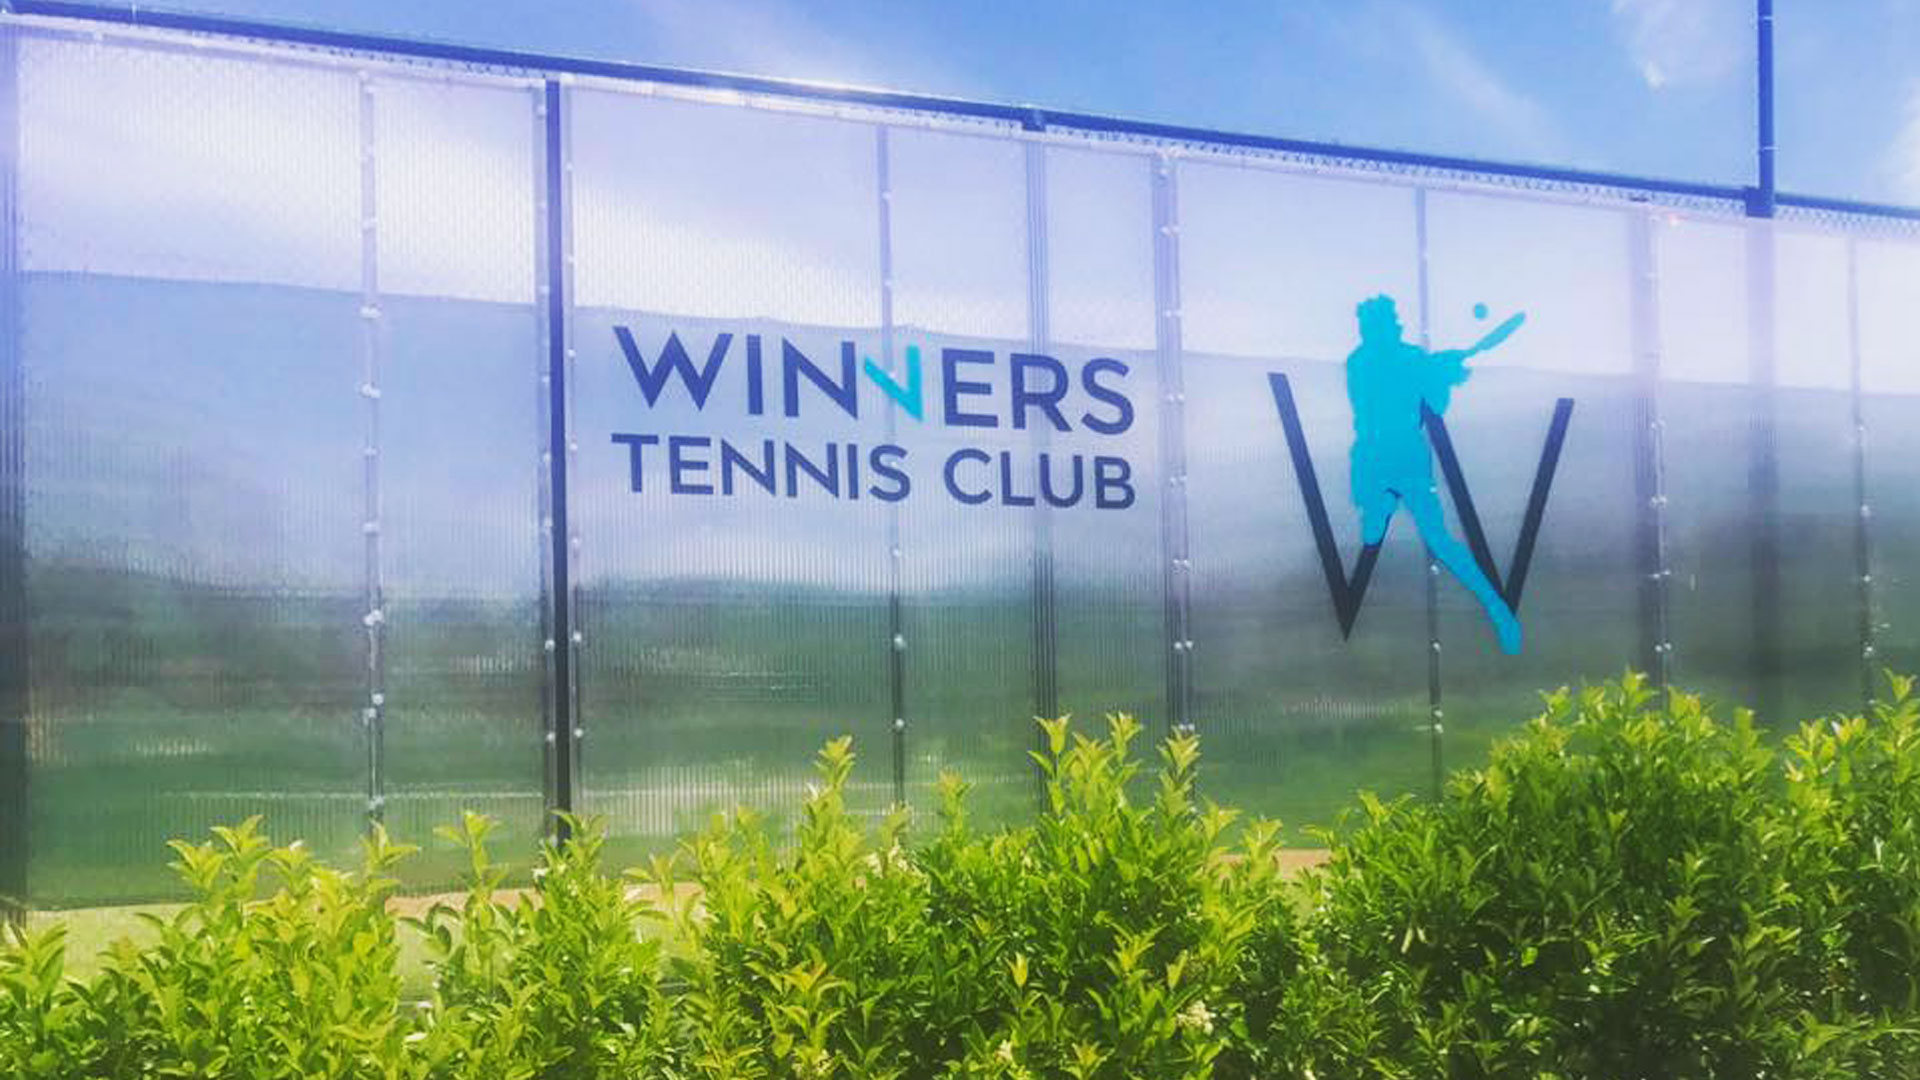 Winners Tennis Club Vari